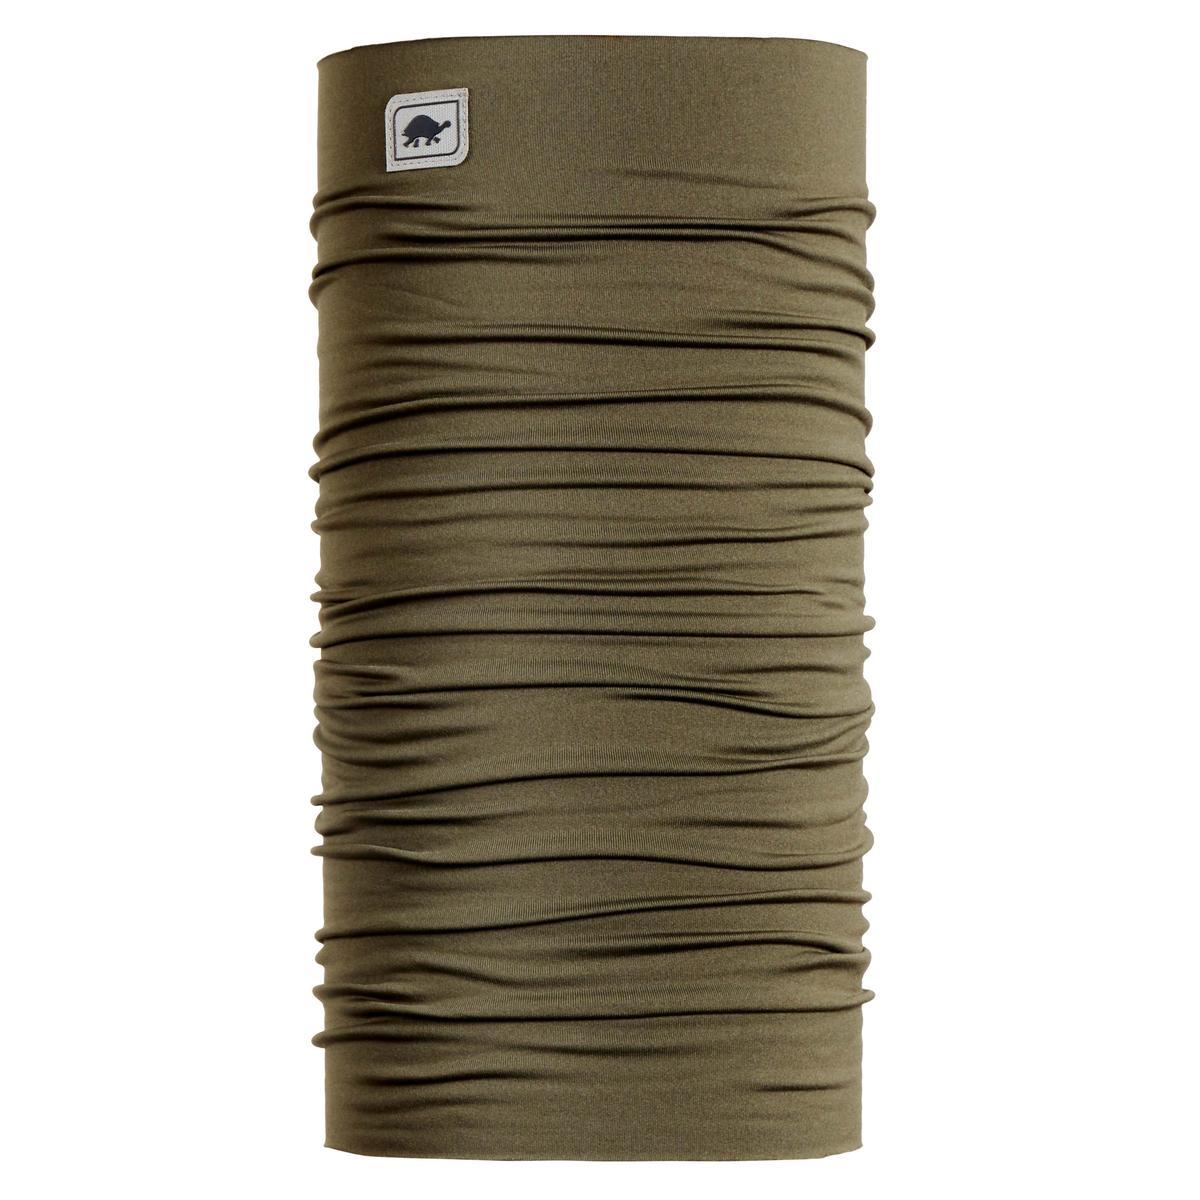 Turtle Fur Totally Tubular Comfort Shell Tube Neck Gaiter Sage Advice - One Size